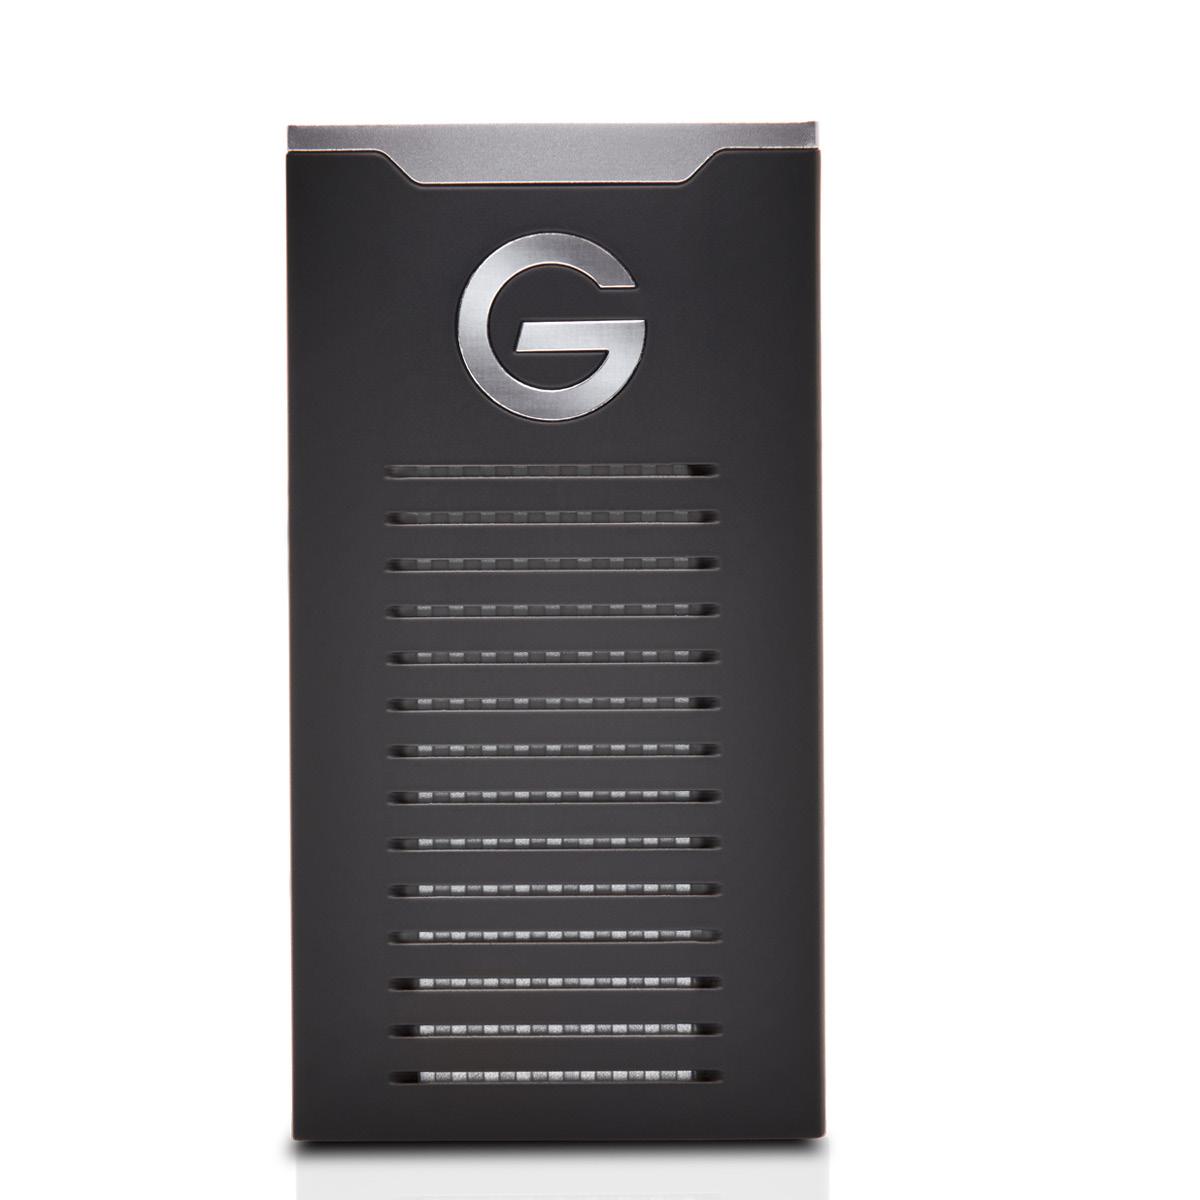 Sandisk 1 TB Professional G-Drive SSD